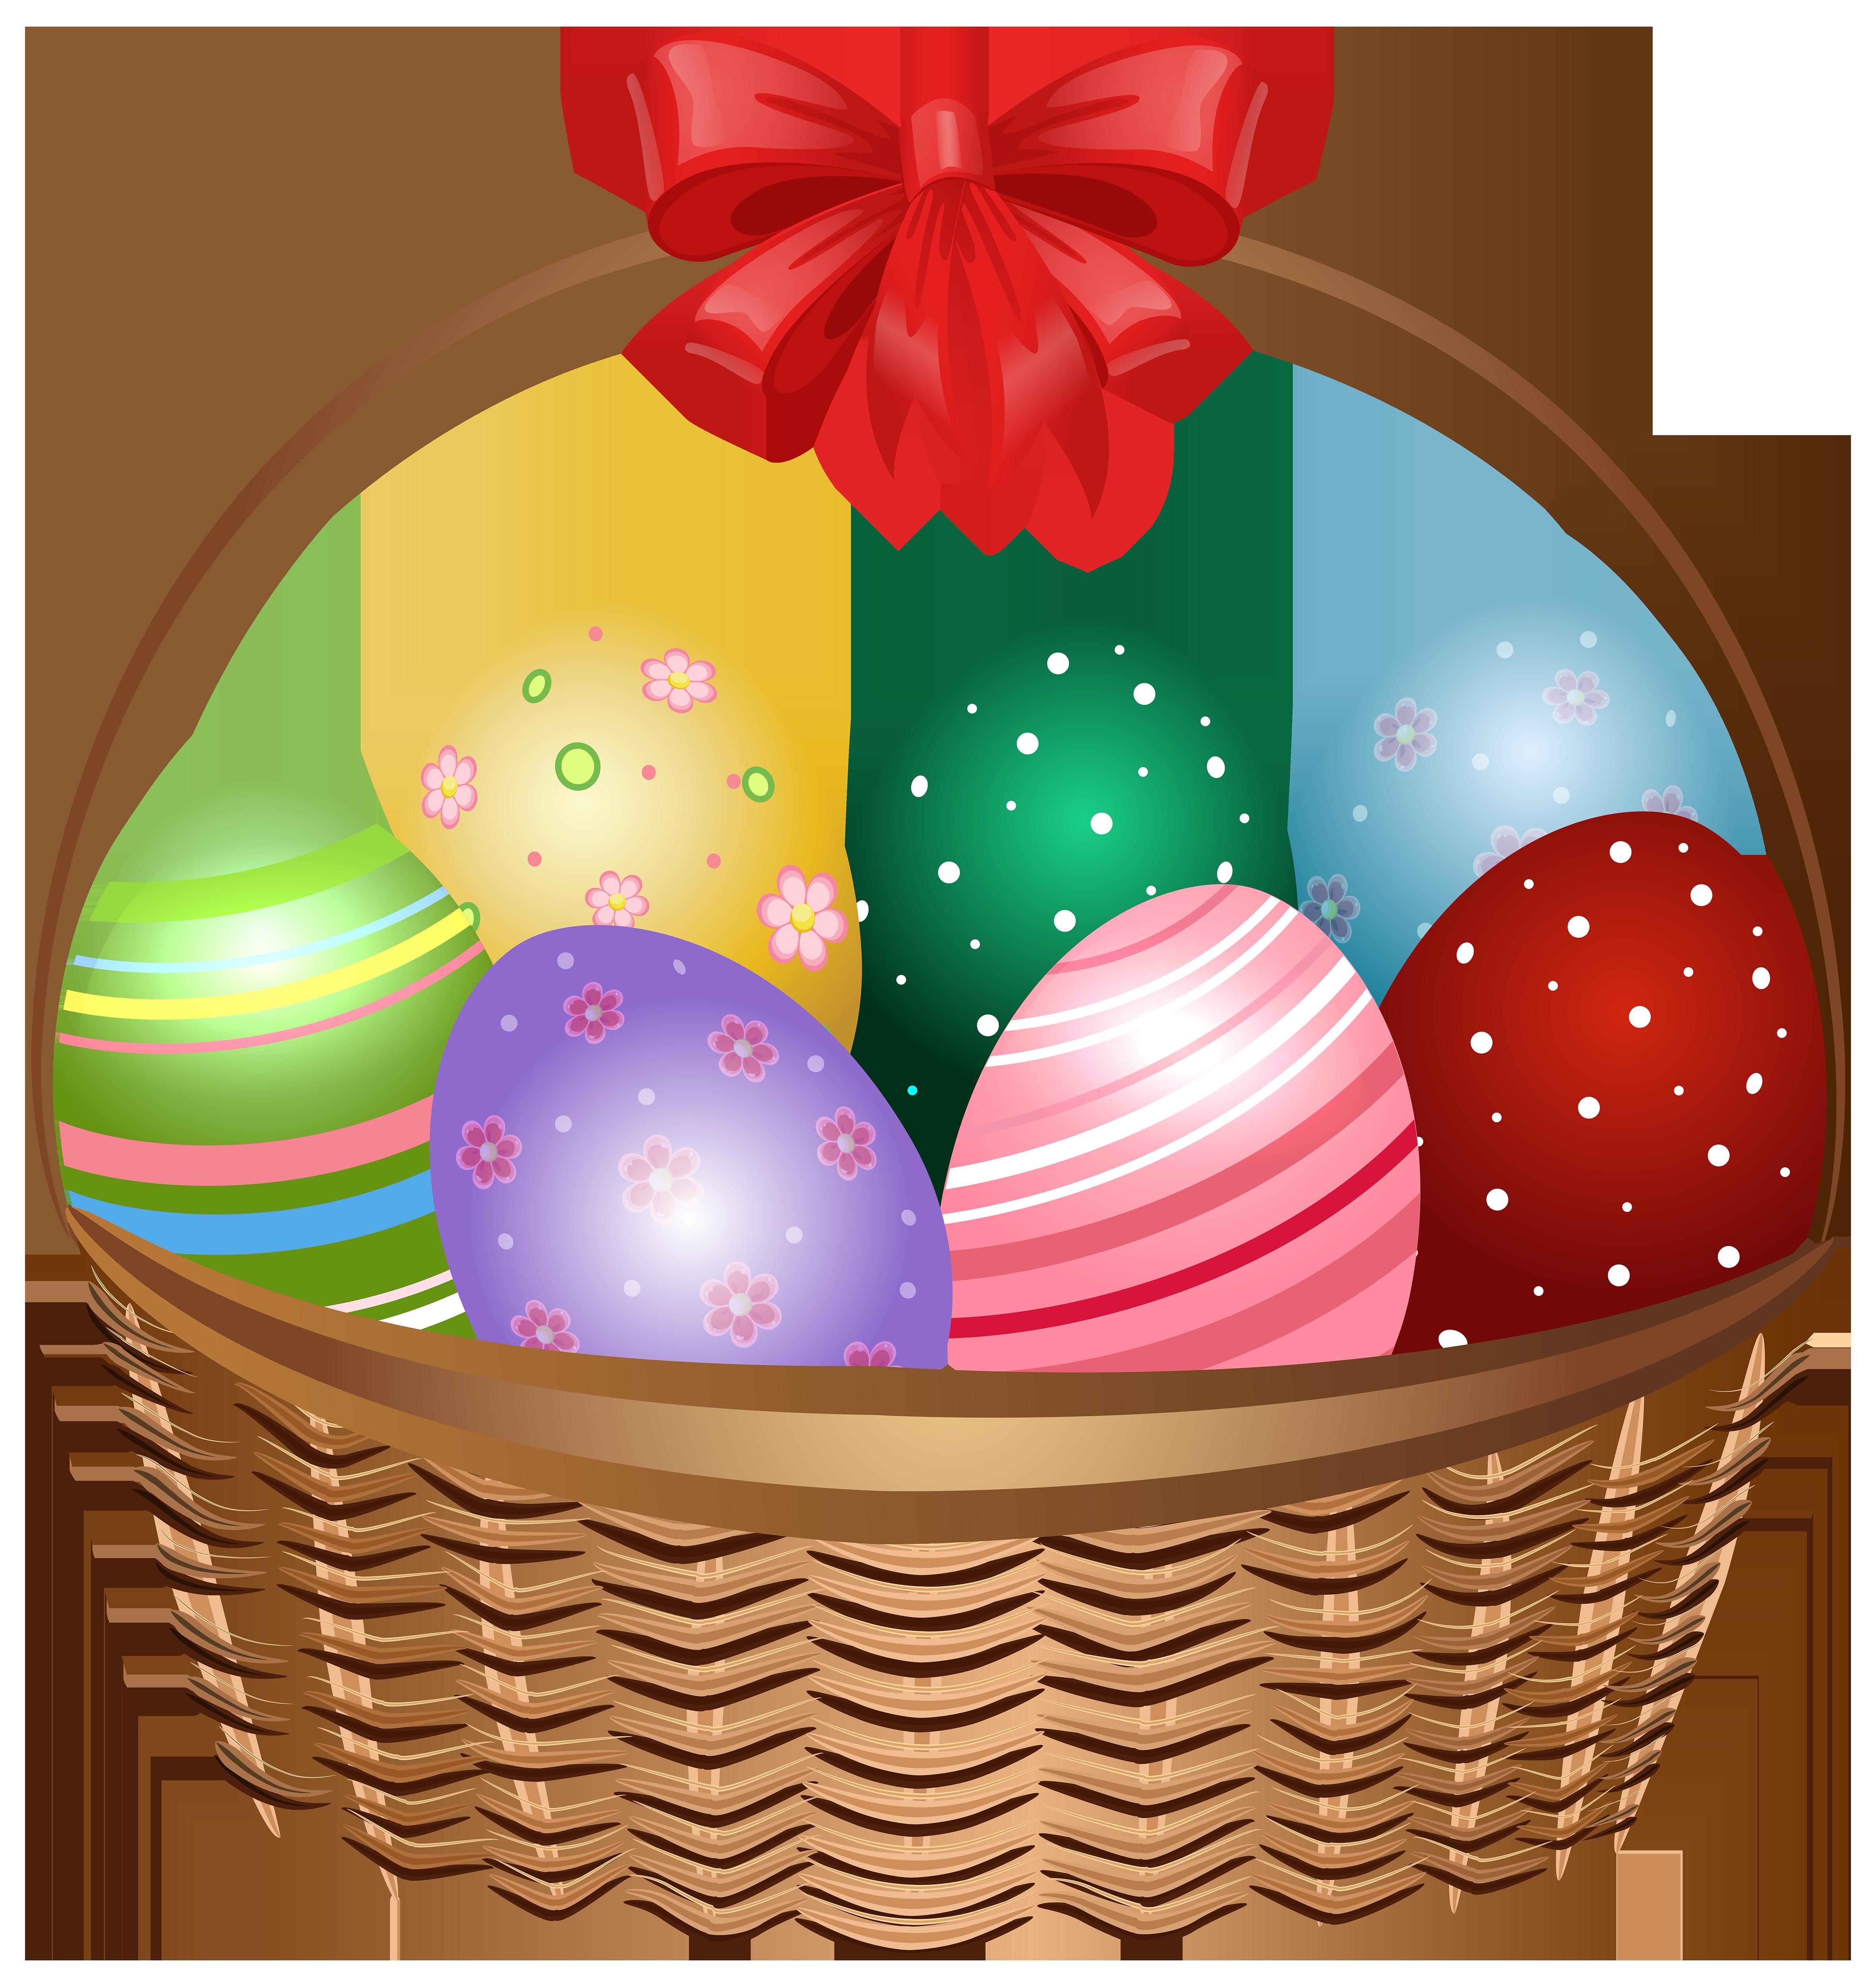 4721x5000 Easter Basket Clip Art Imageu200b Gallery Yopriceville